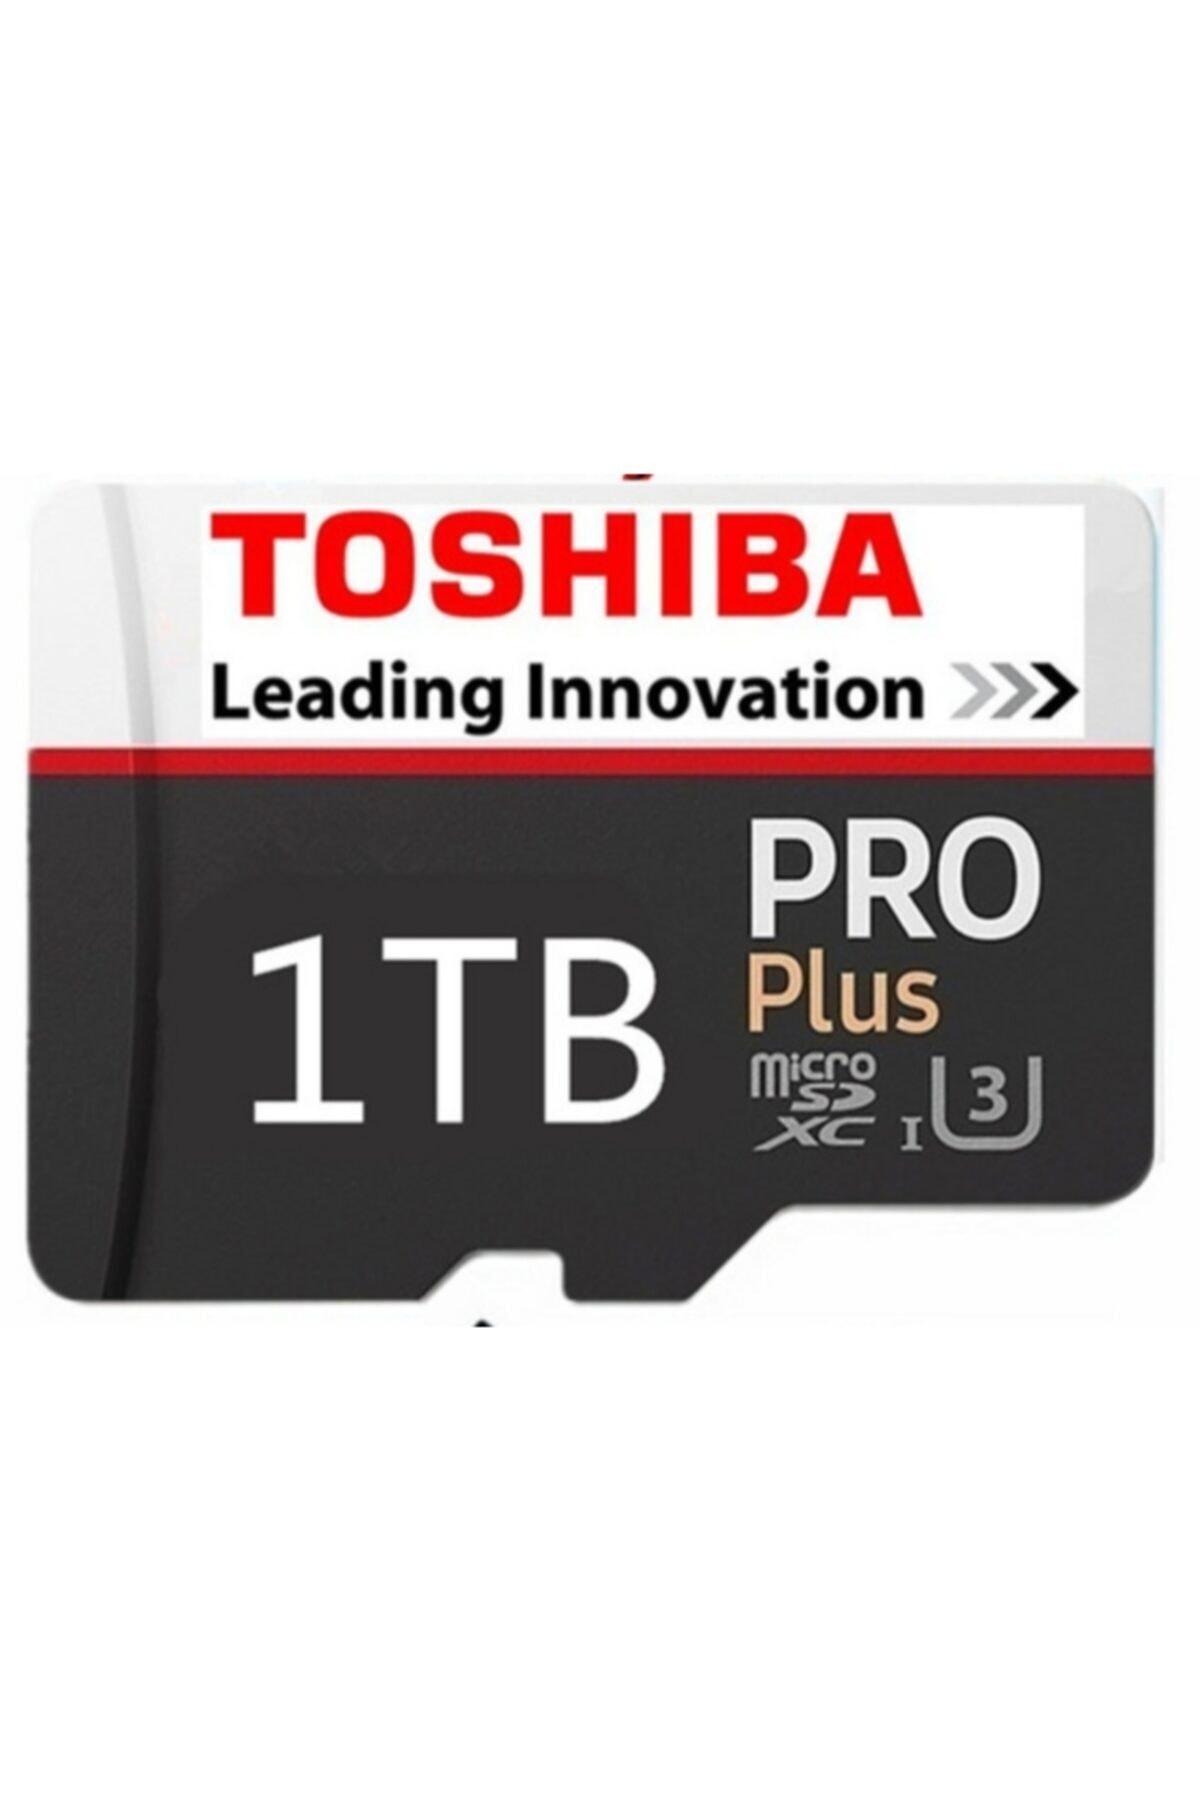 1 Tb Toshıba Micro Sd Kart